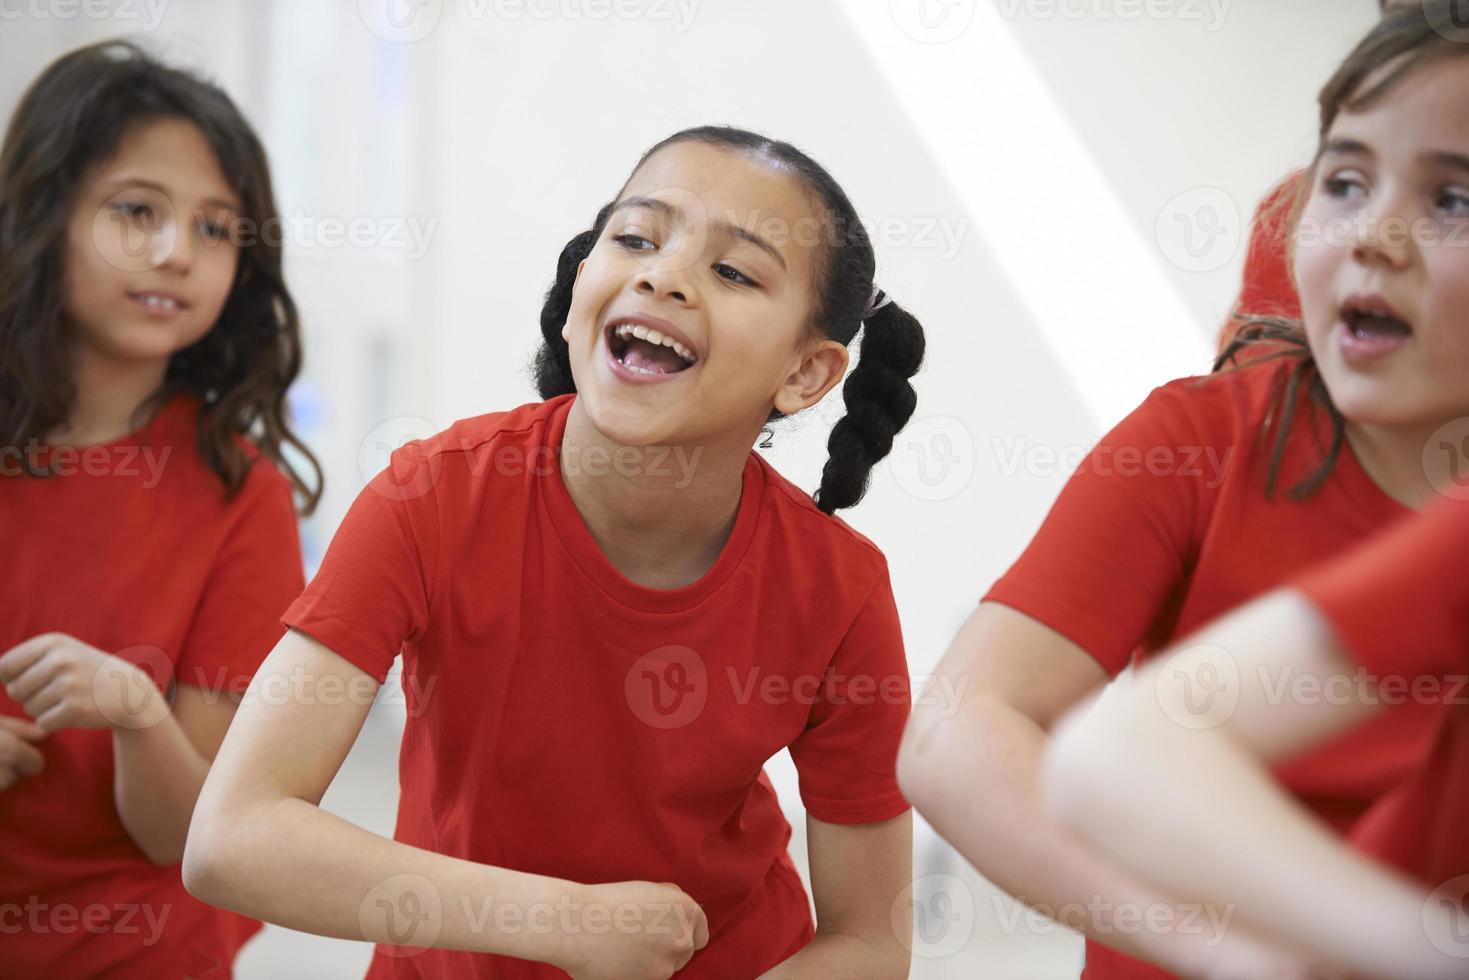 Group Of Children Enjoying Dance Class Together photo